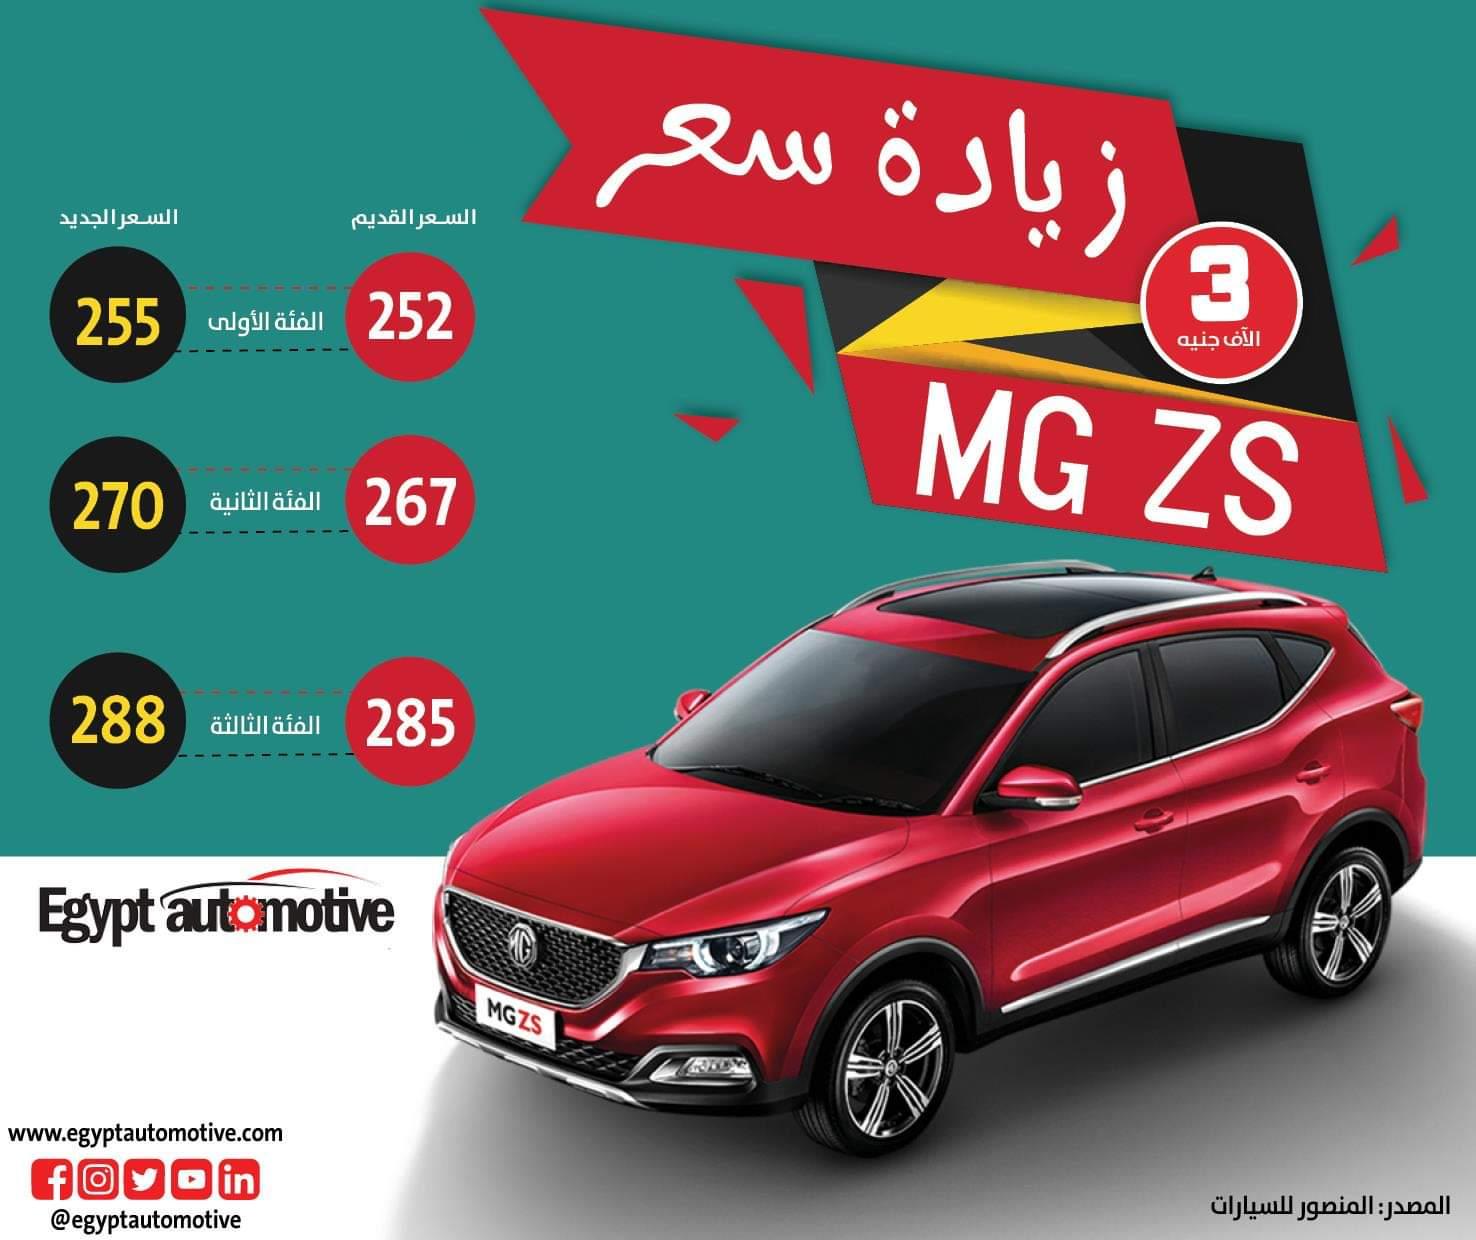 سعر MG ZS يرتفع 3 آلاف جنيه